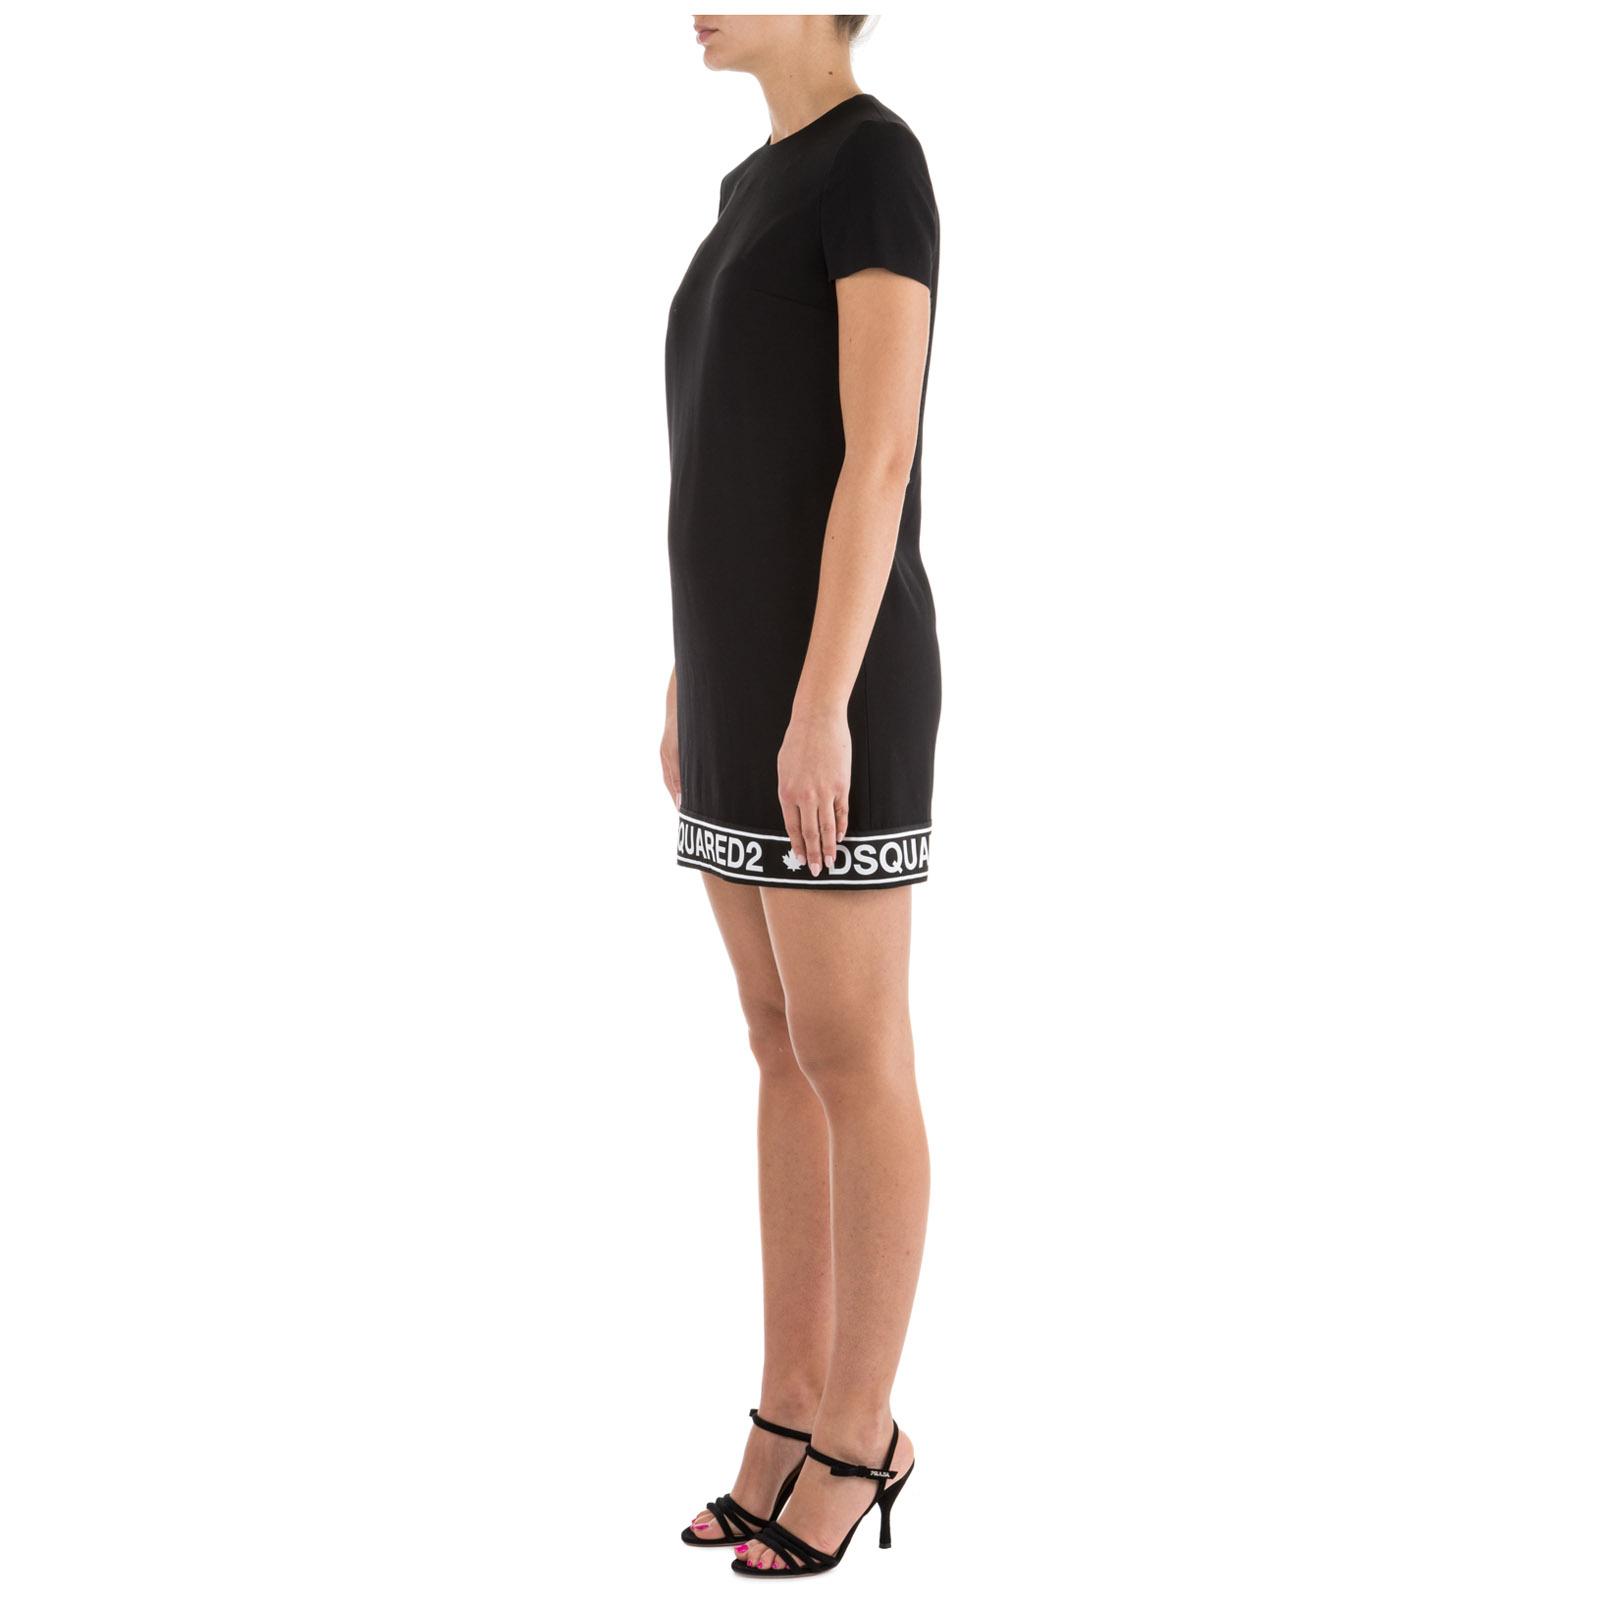 Women's knee length dress short sleeve